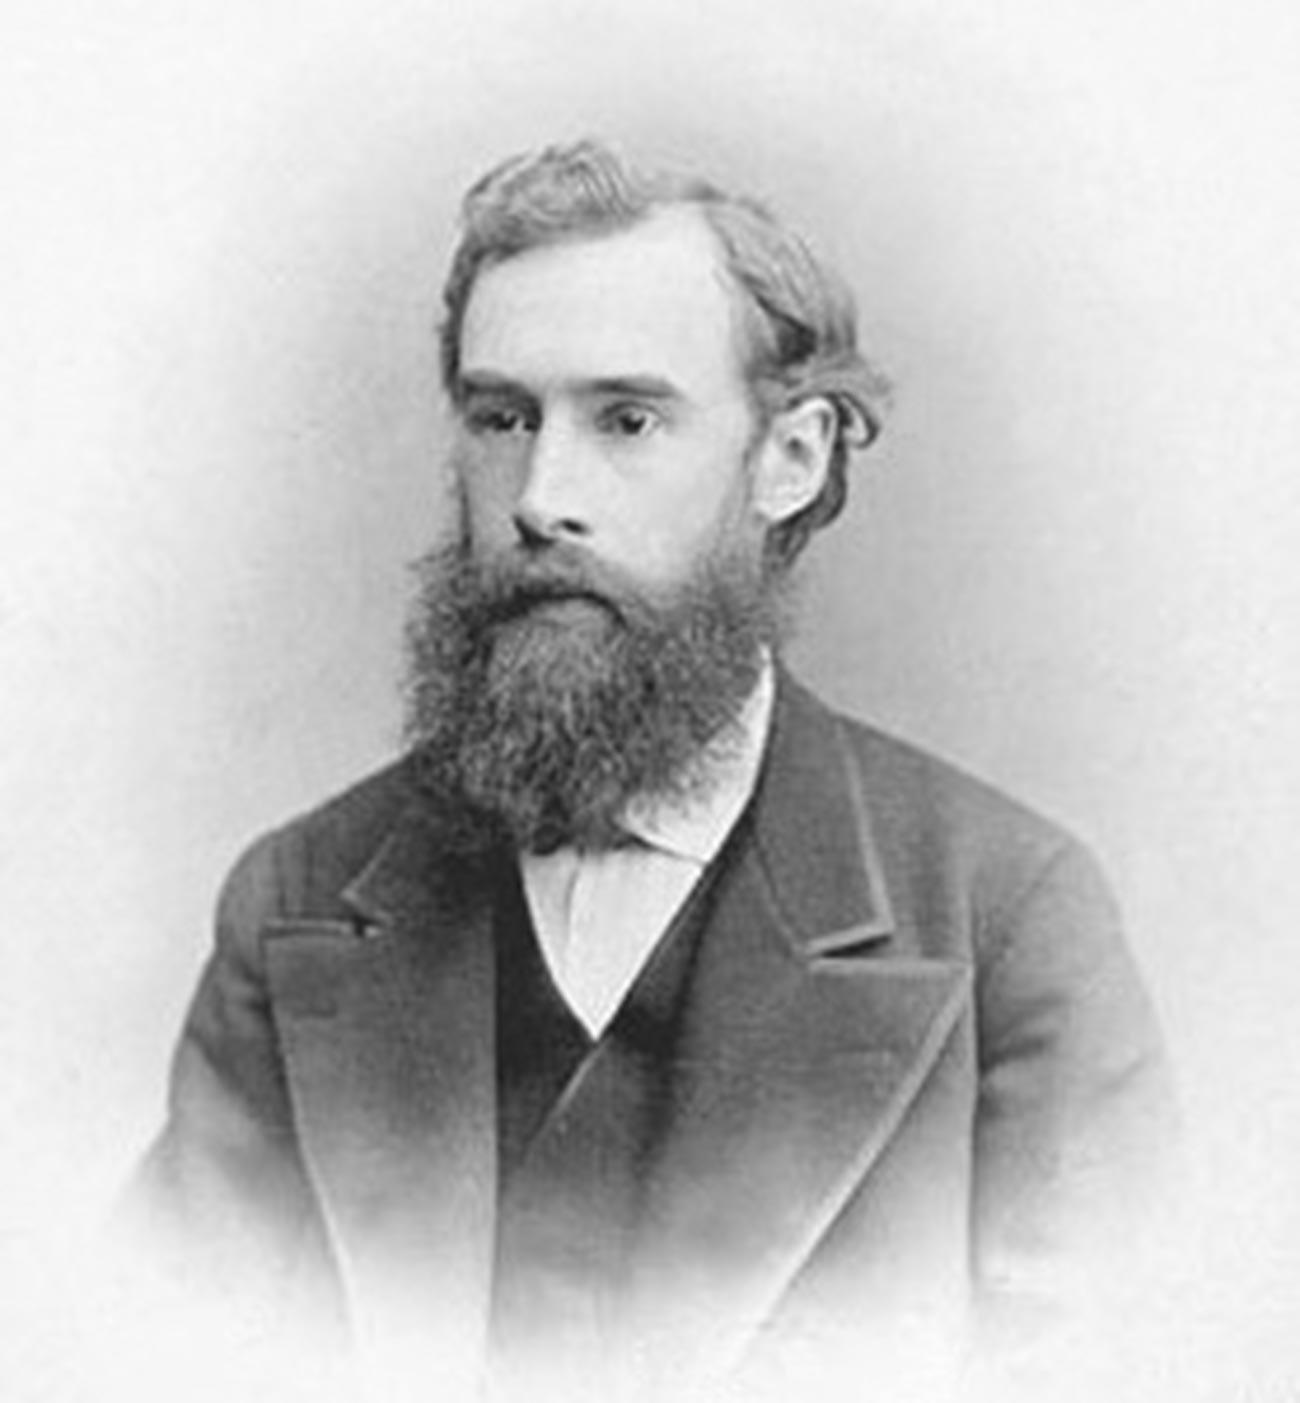 Pavel Tretjakov leta 1892